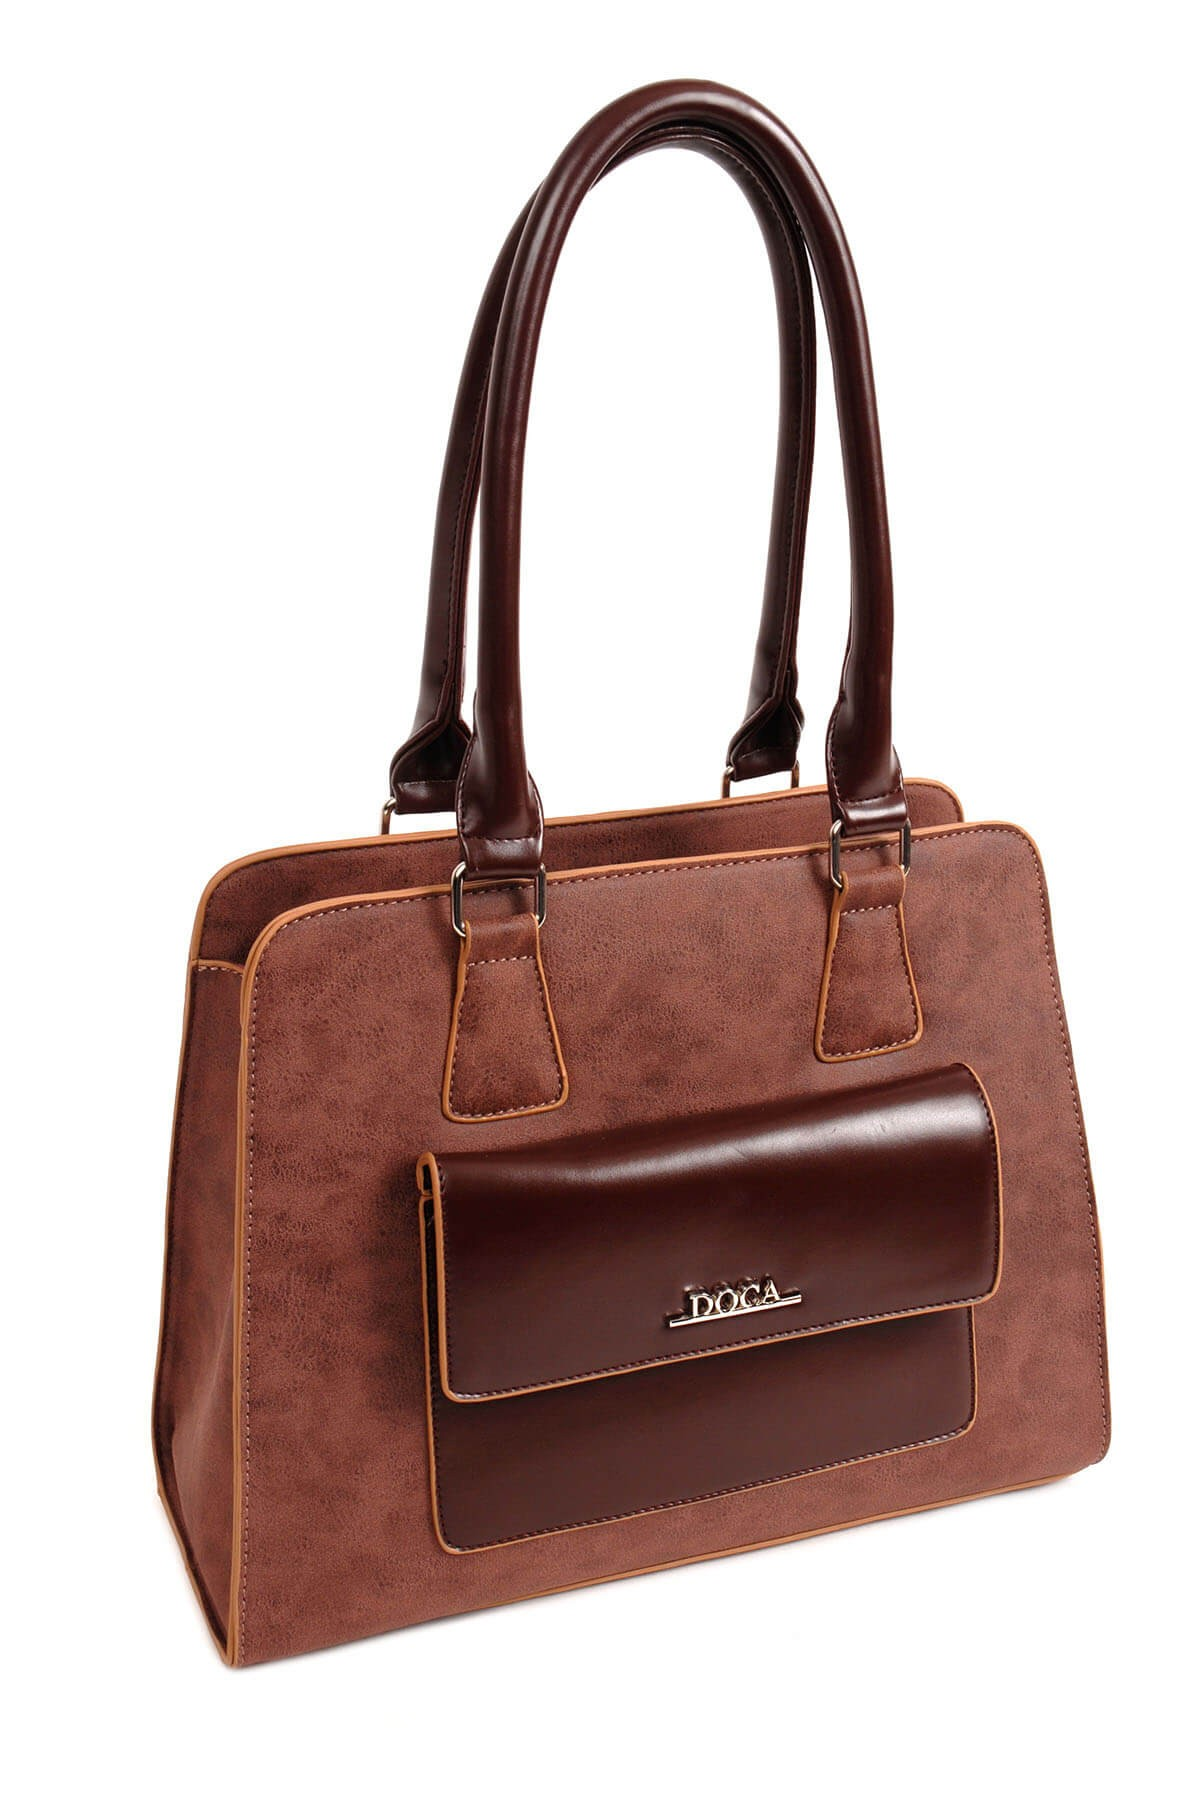 Dámska kabelka Doca 14169 - hnedá